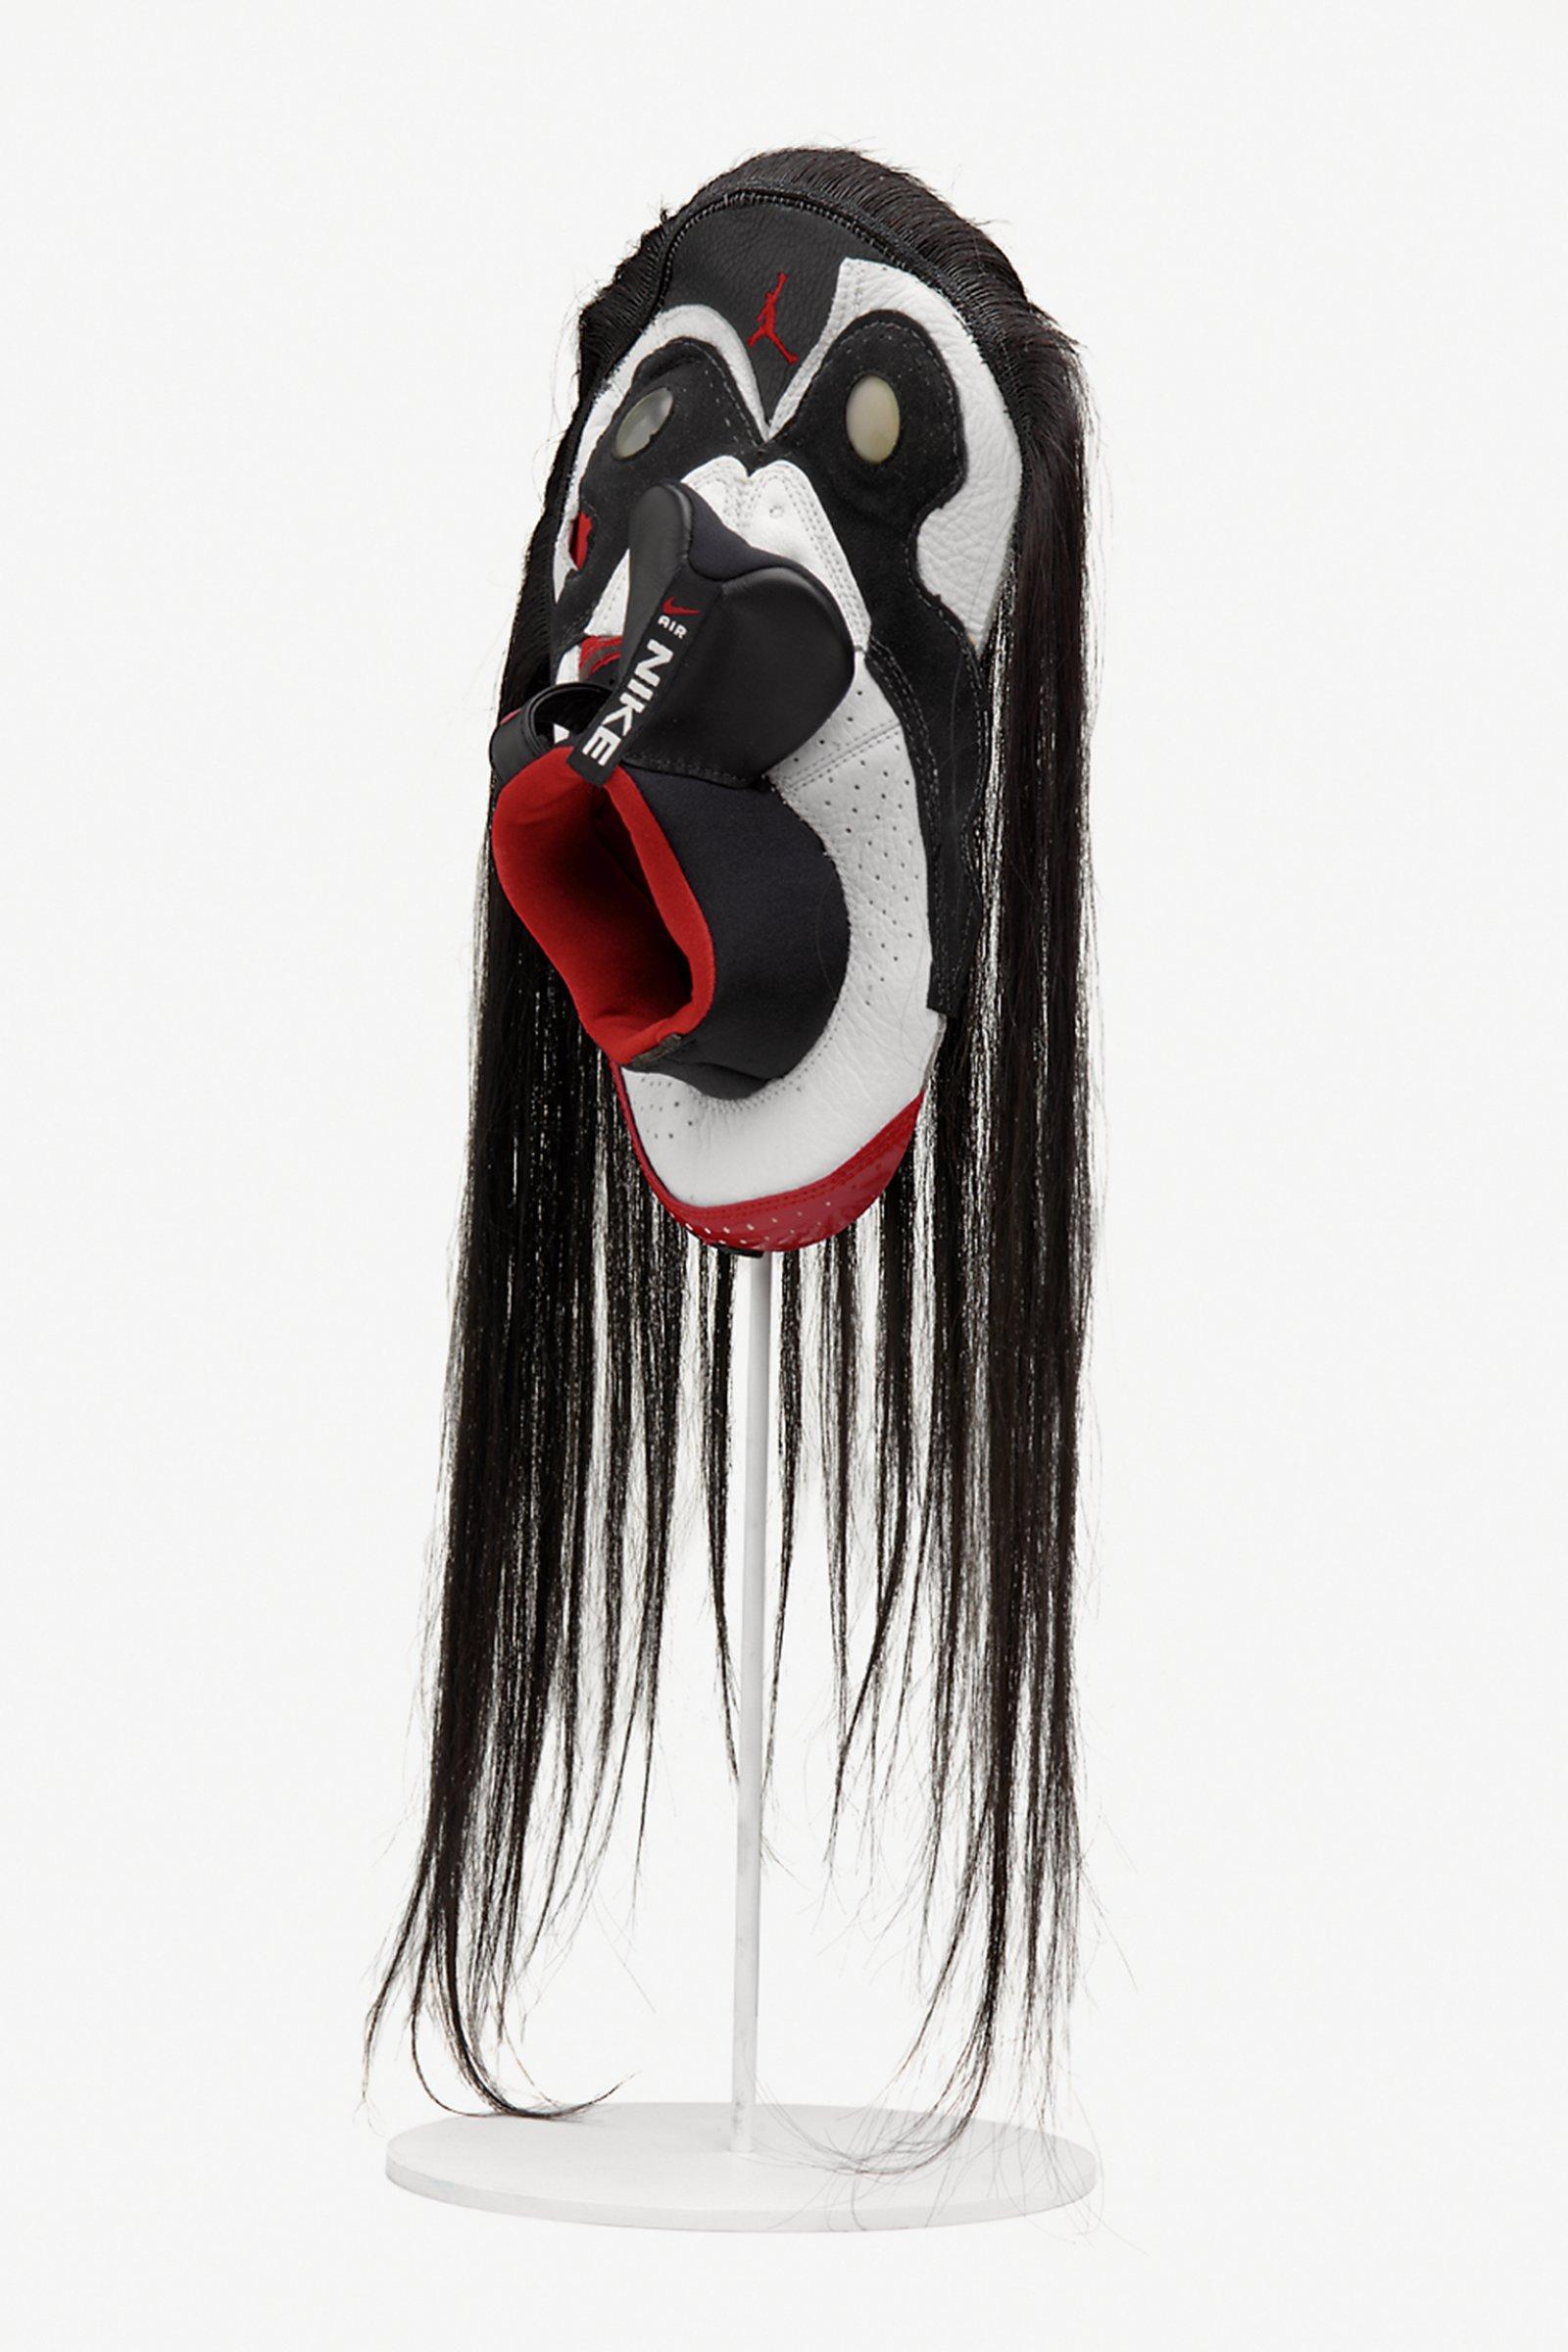 BrianJungen,Prototype for New Understanding #9, 1999, nike air jordans, human hair, 24 x 10 x 5in. (61 x 25 x 13 cm)